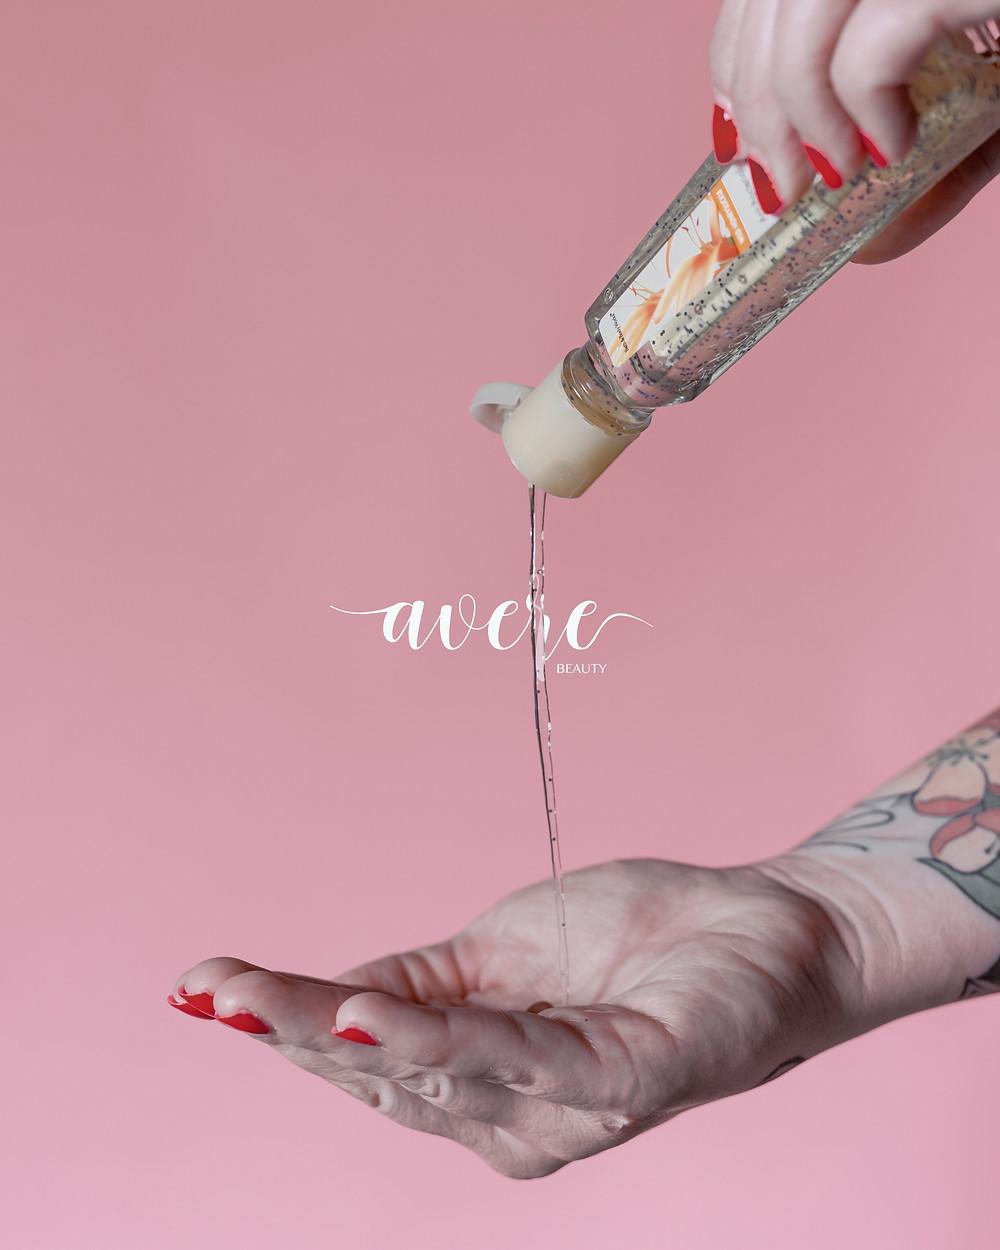 Avere Beauty using hand sanitizer amidst the coronavirus outbreak in Pittsburgh